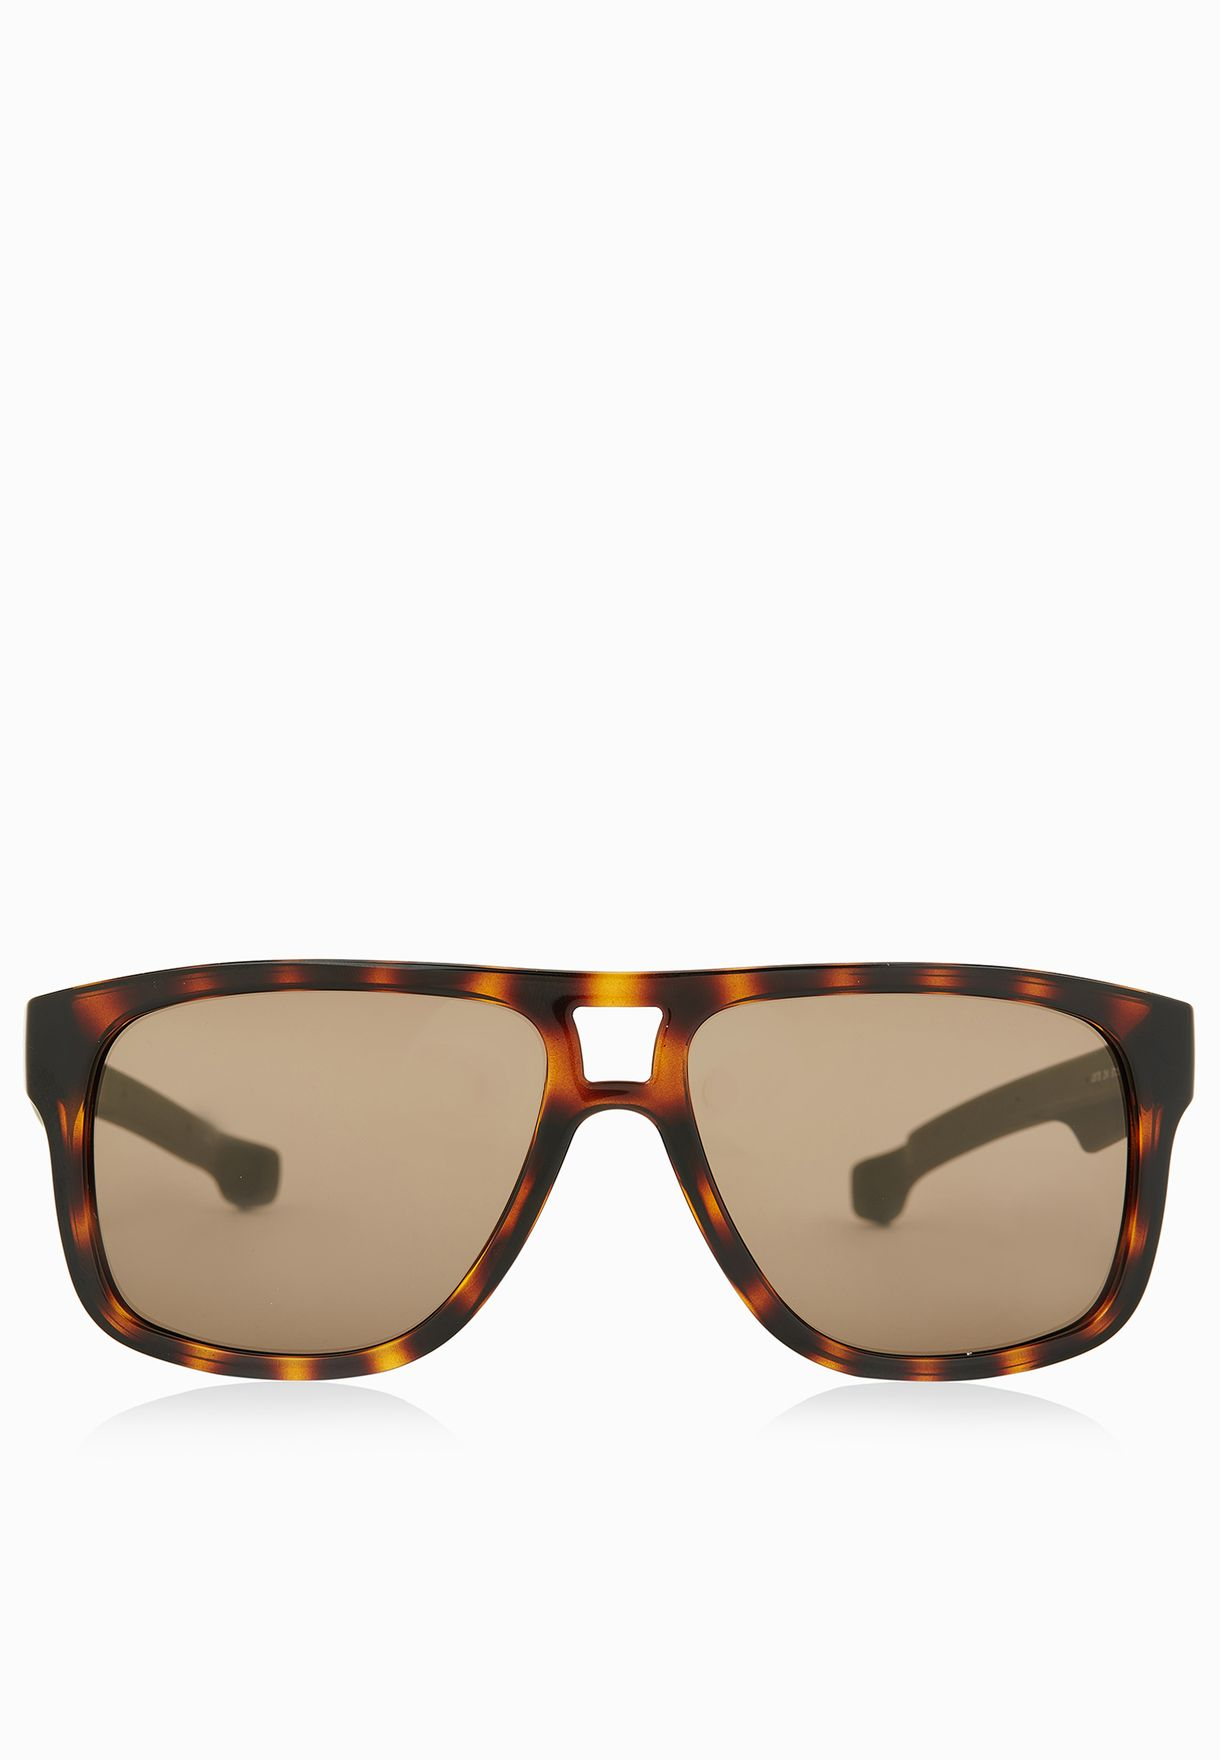 114fa3c57ed Shop Lacoste browns Magnetic Frame Rectangle Sunglasses L817S-214 ...